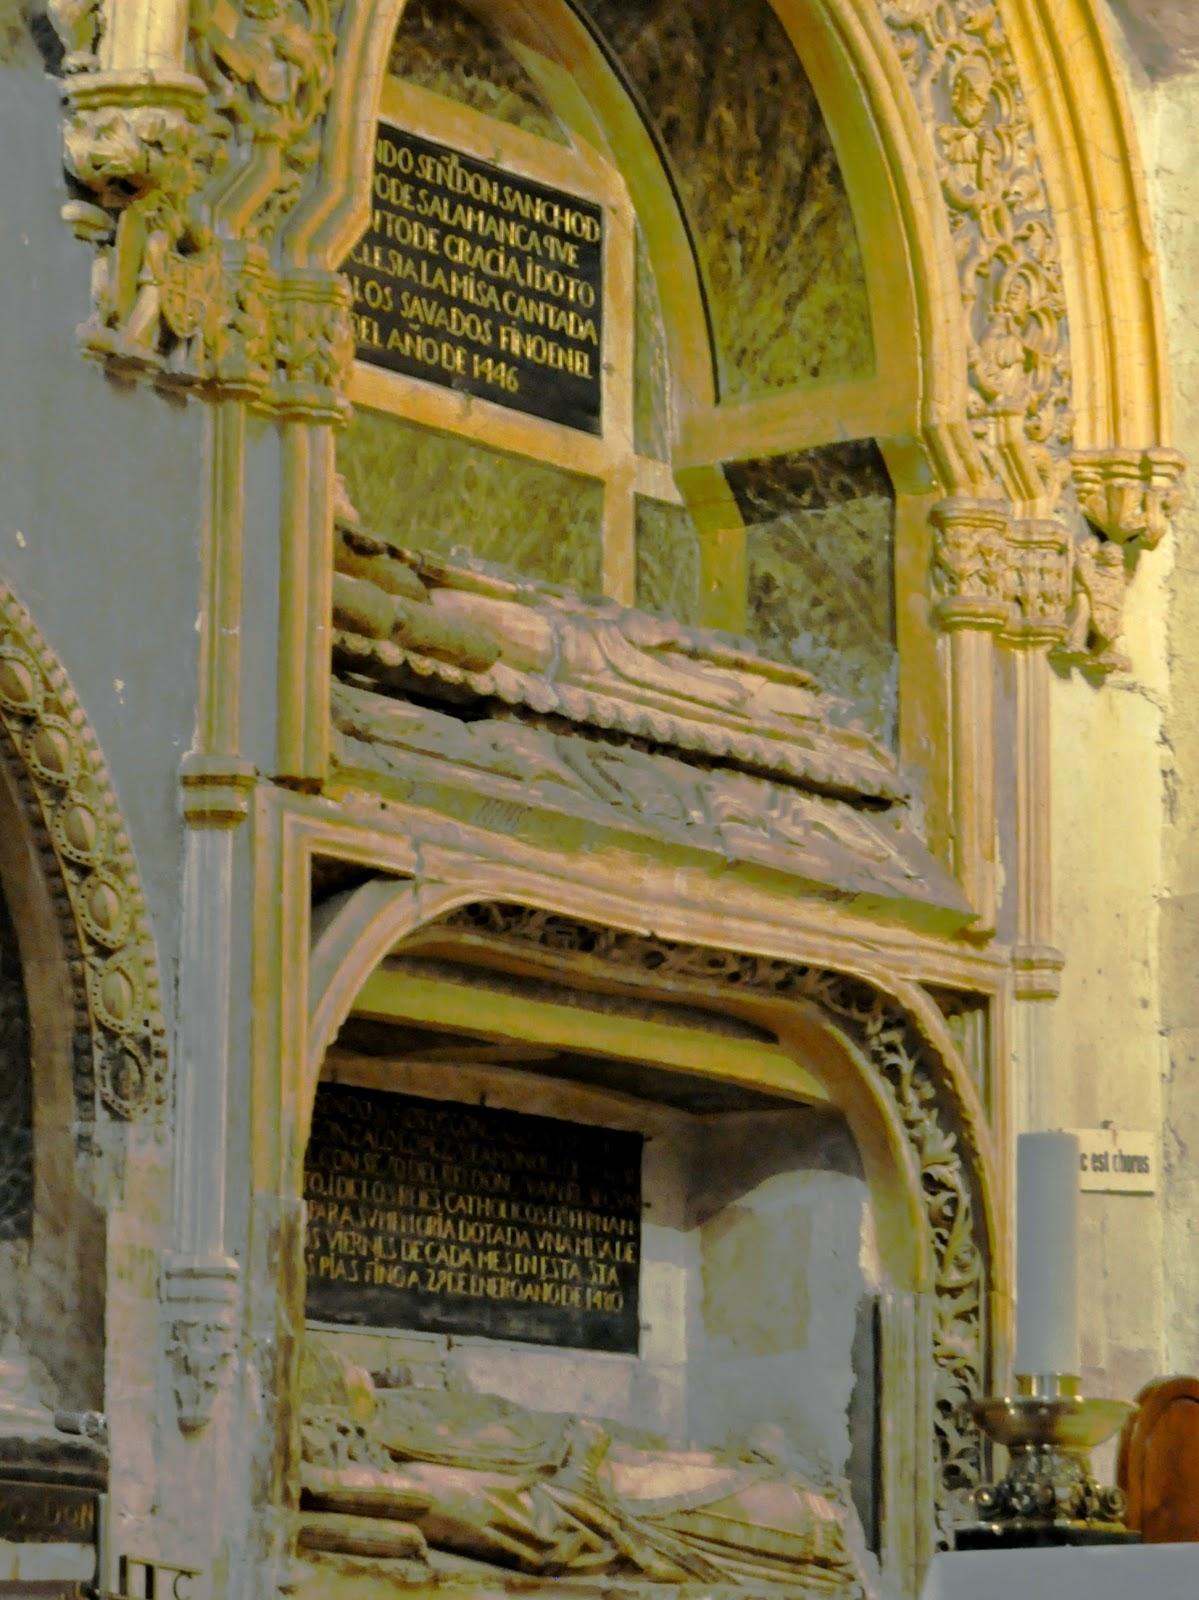 Buscando montsalvatge salamanca catedral vieja for Viveros salamanca